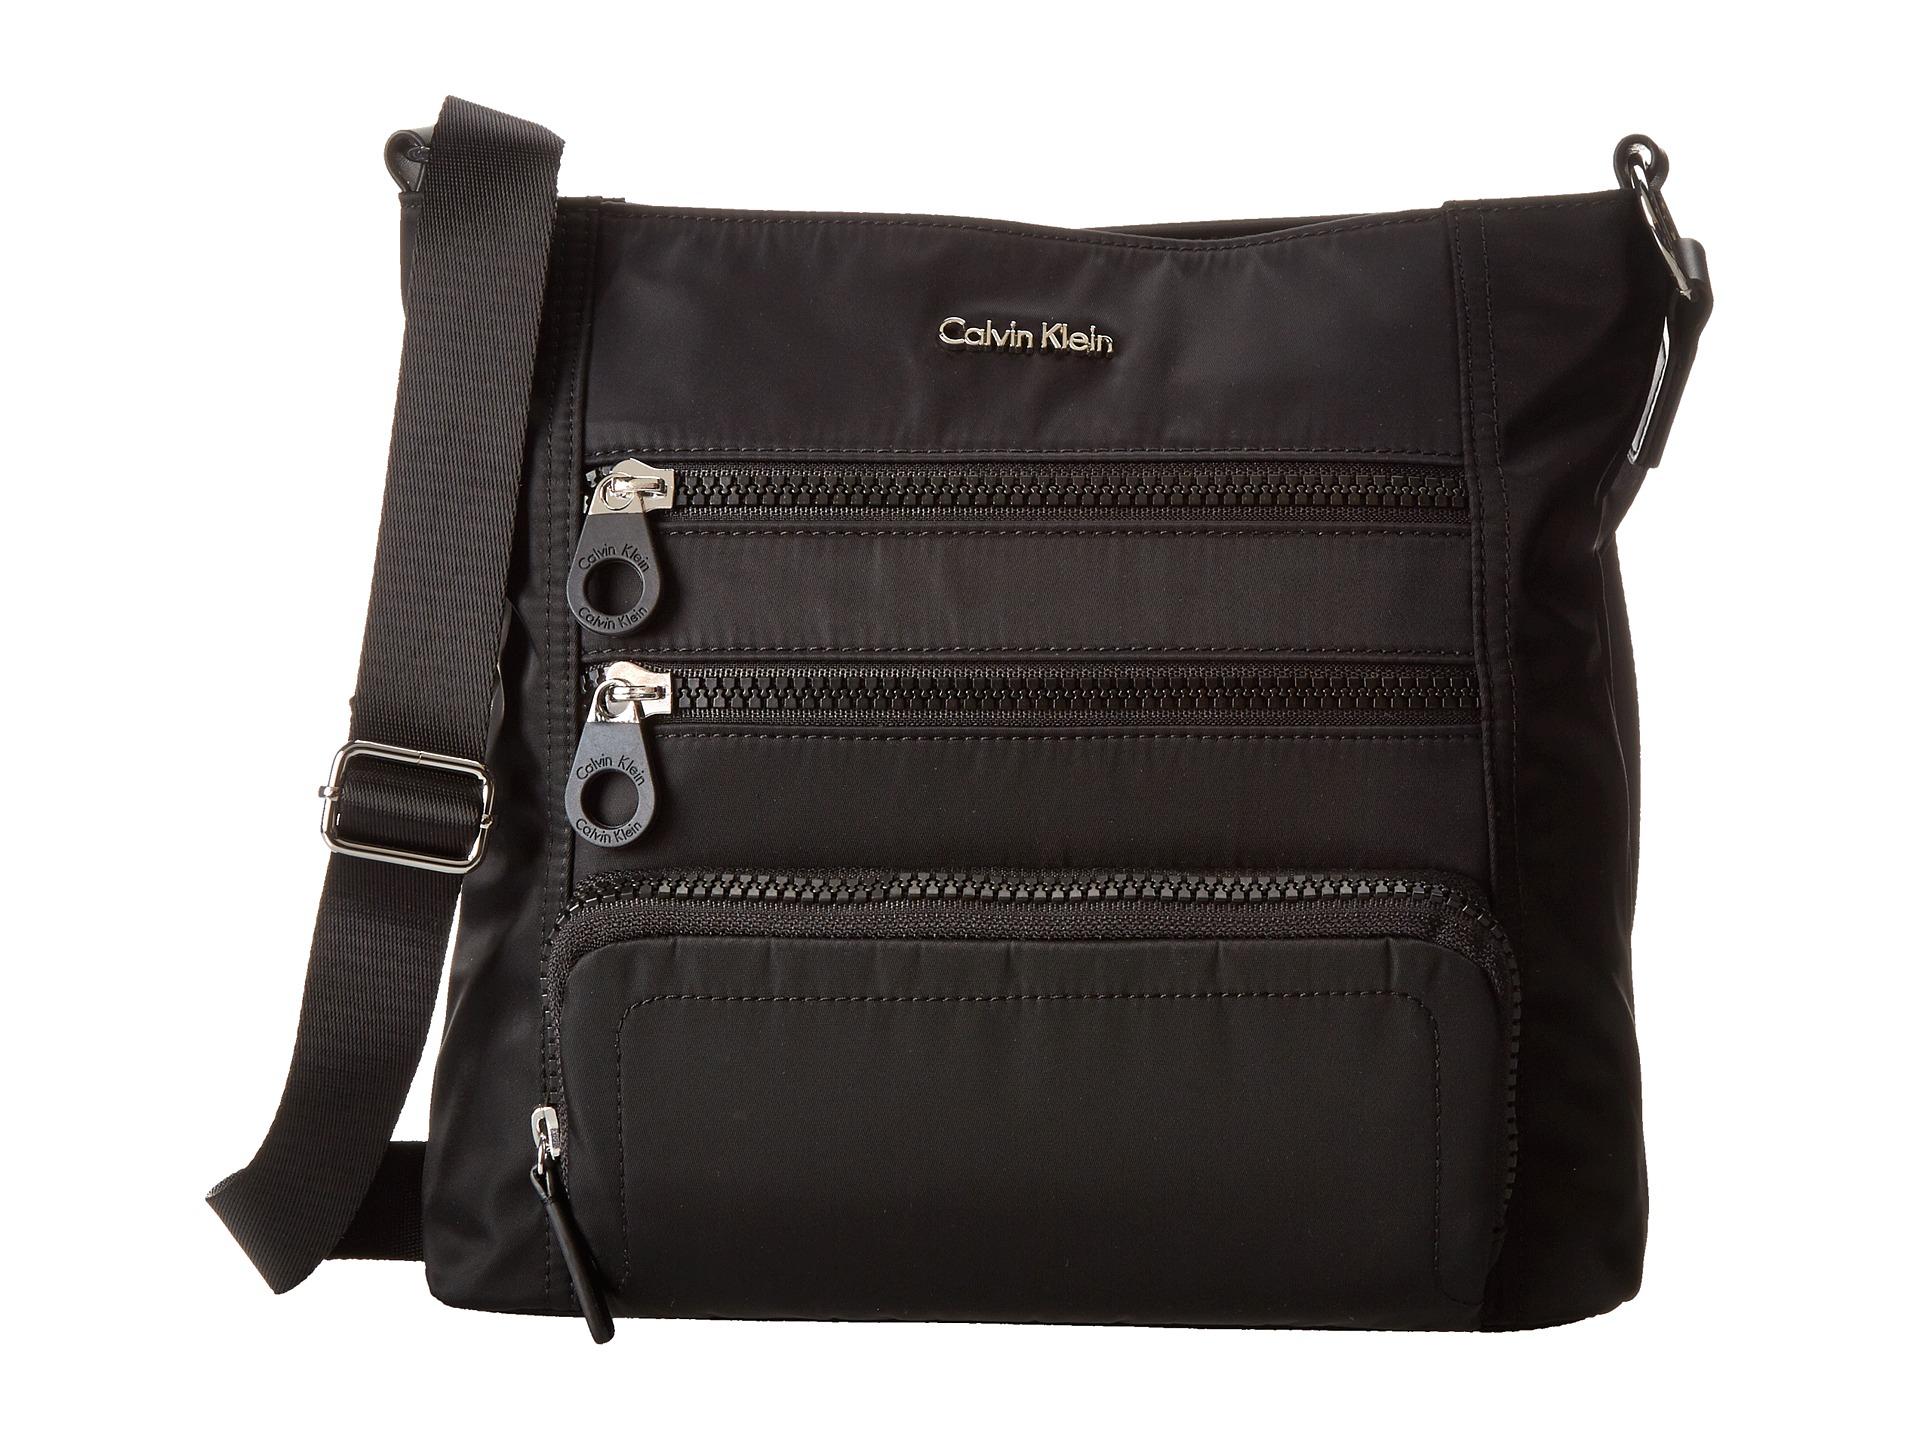 Calvin Klein Nylon Crossbody In Black | Lyst